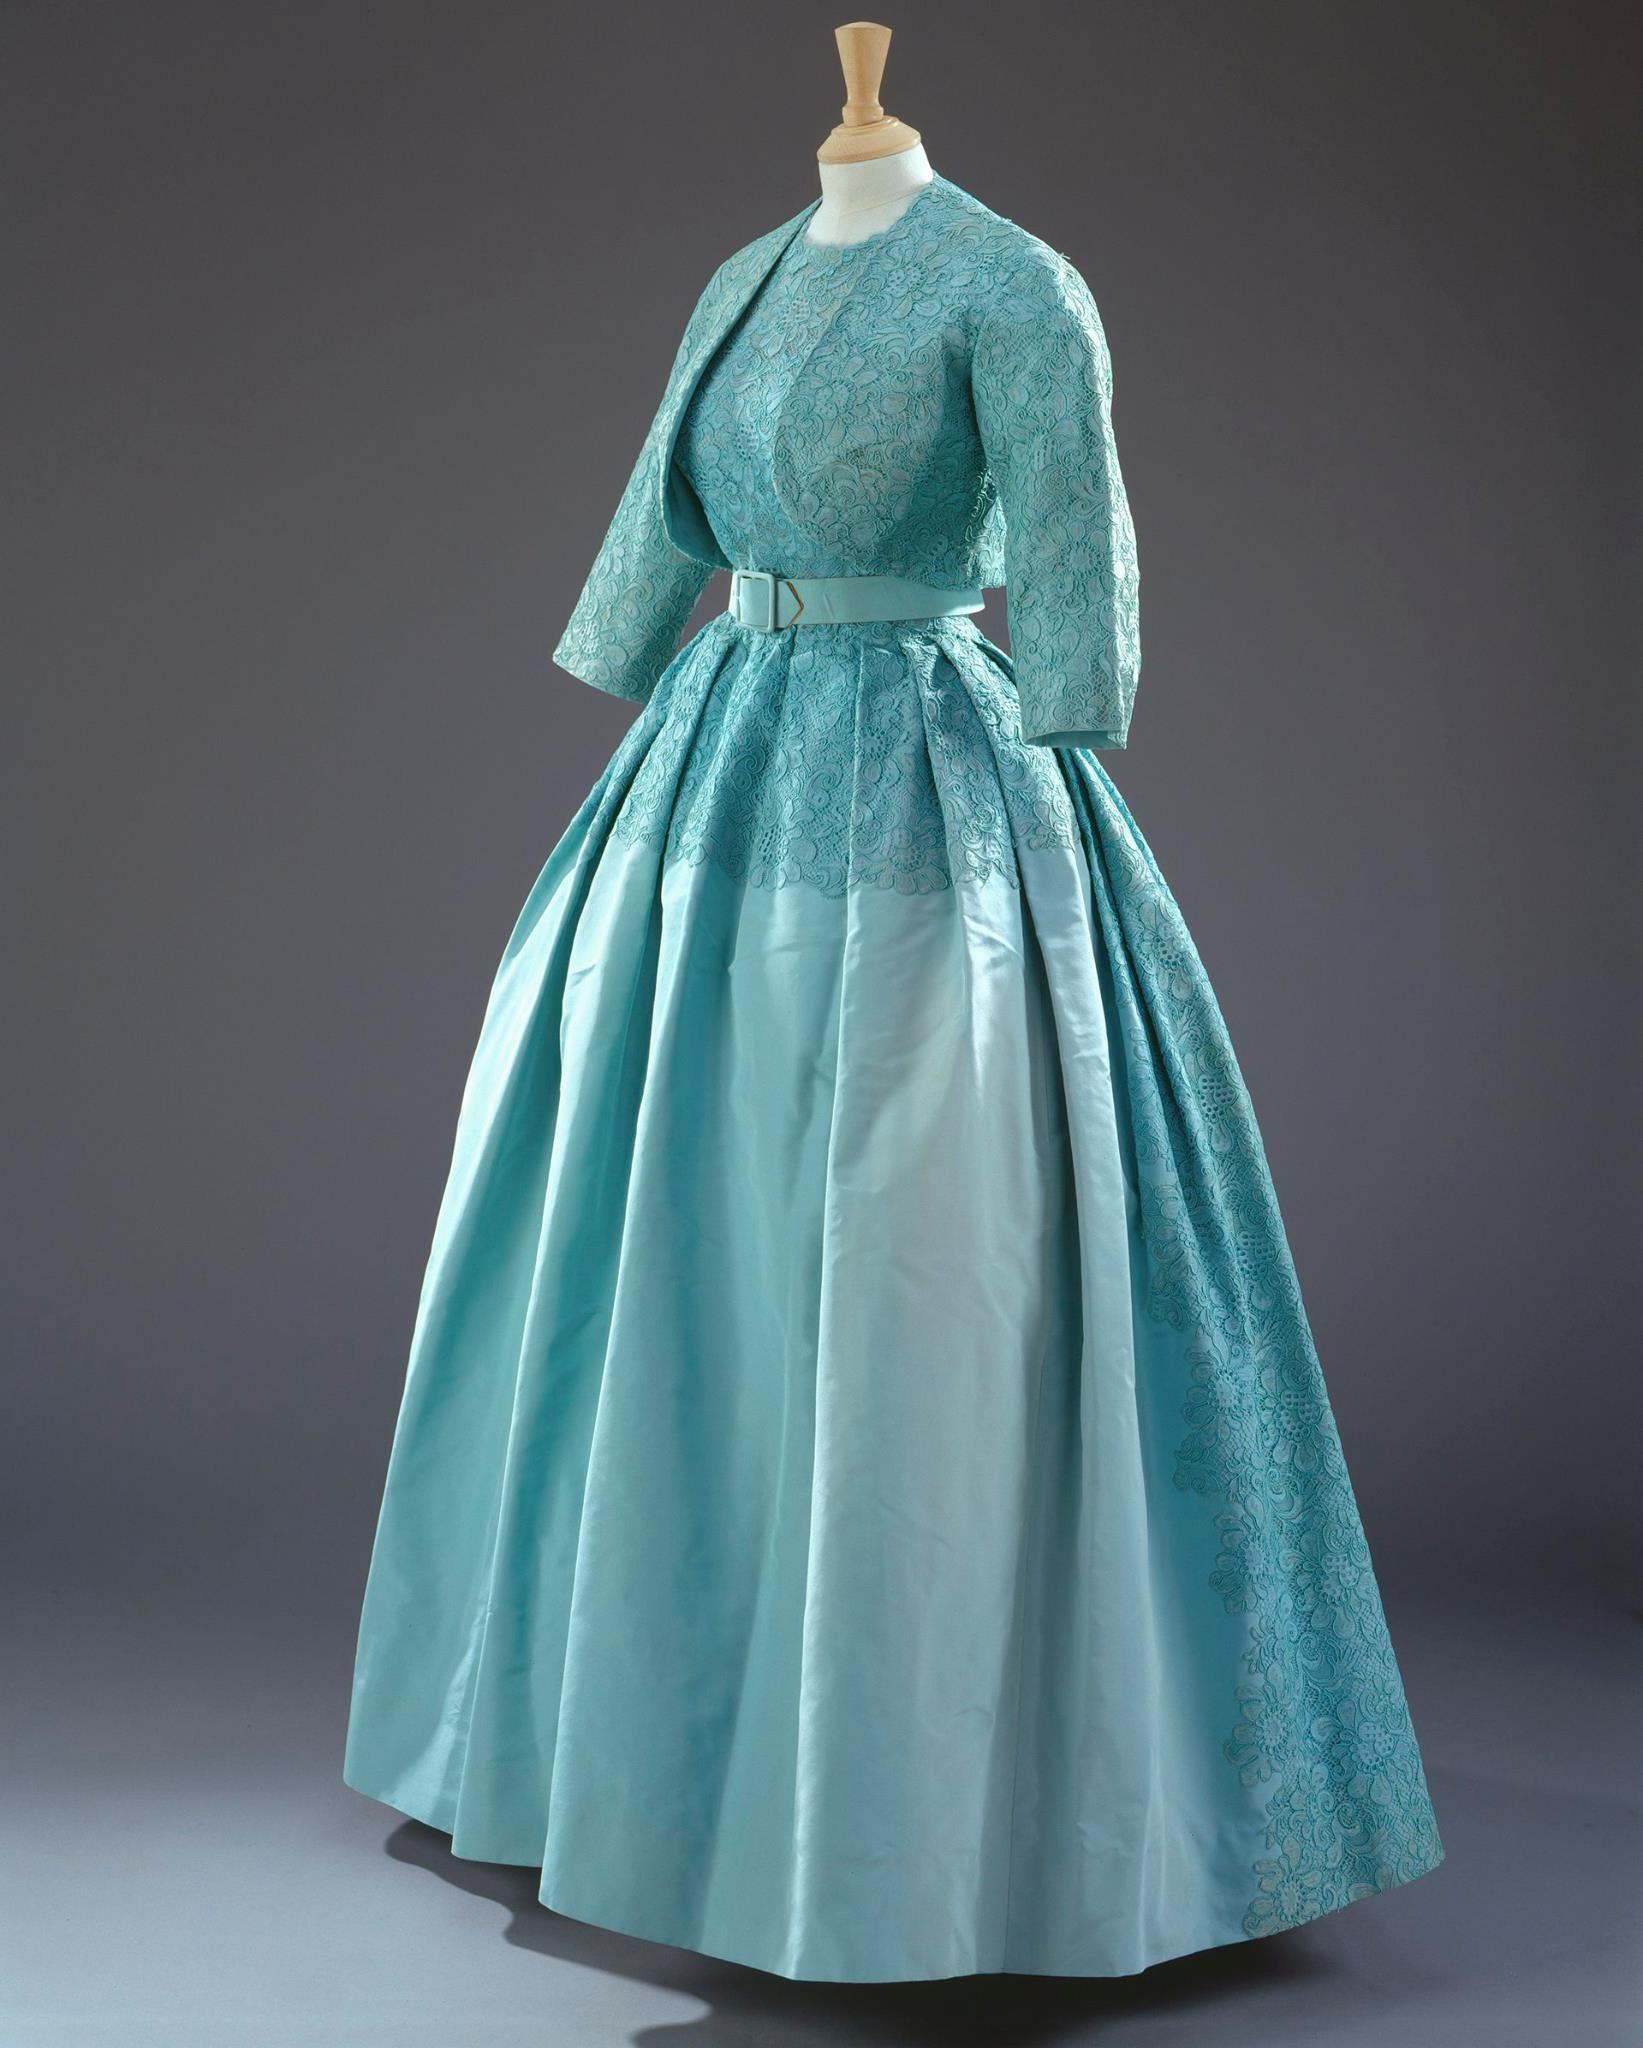 1960 wedding dresses  Norman Hartnell turquoiseblue dress with a matching bolero jacket